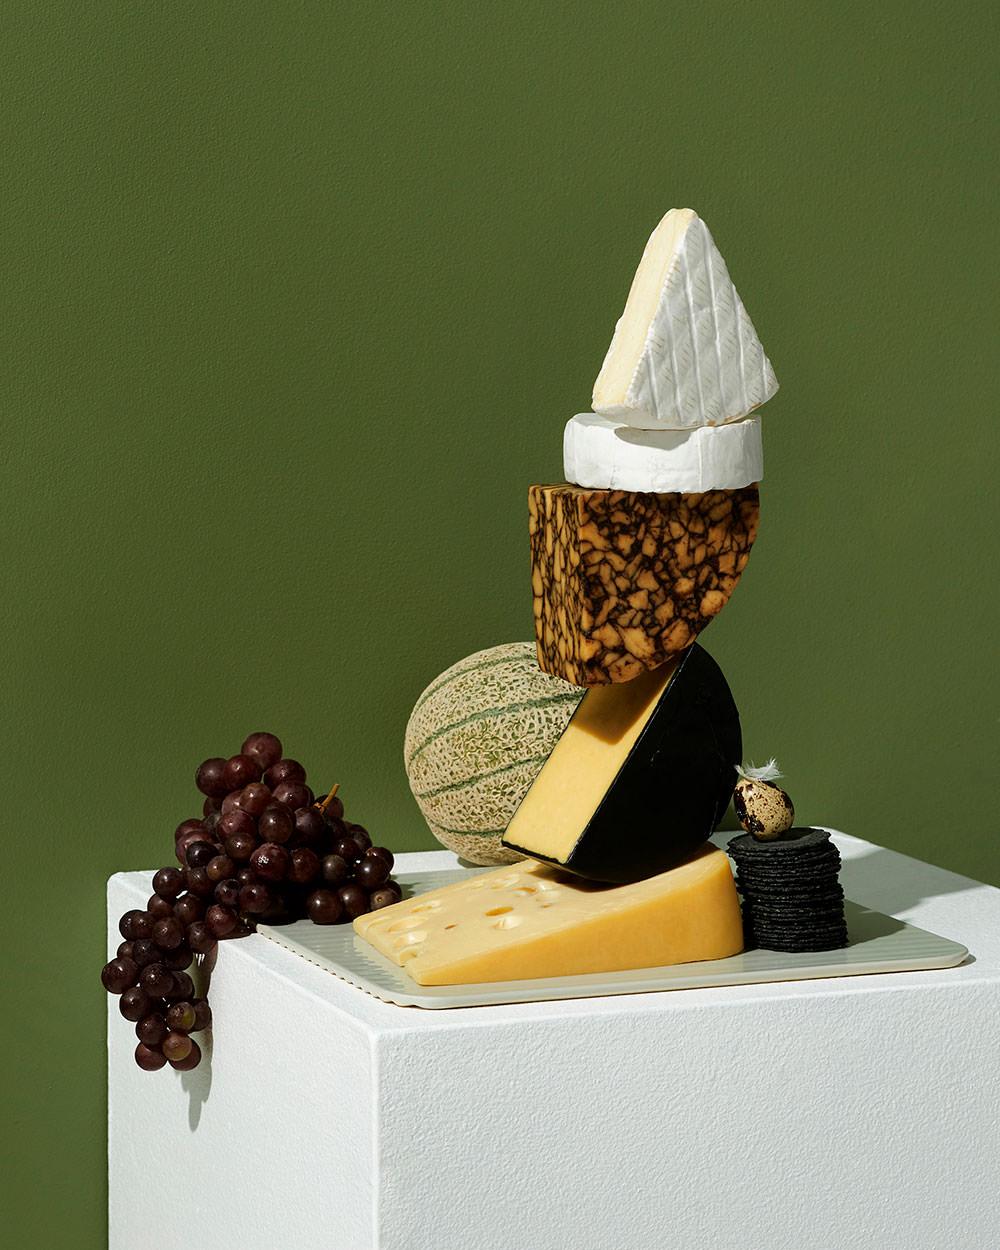 stacked cheese sculpture conceptual still life by camilo mateus